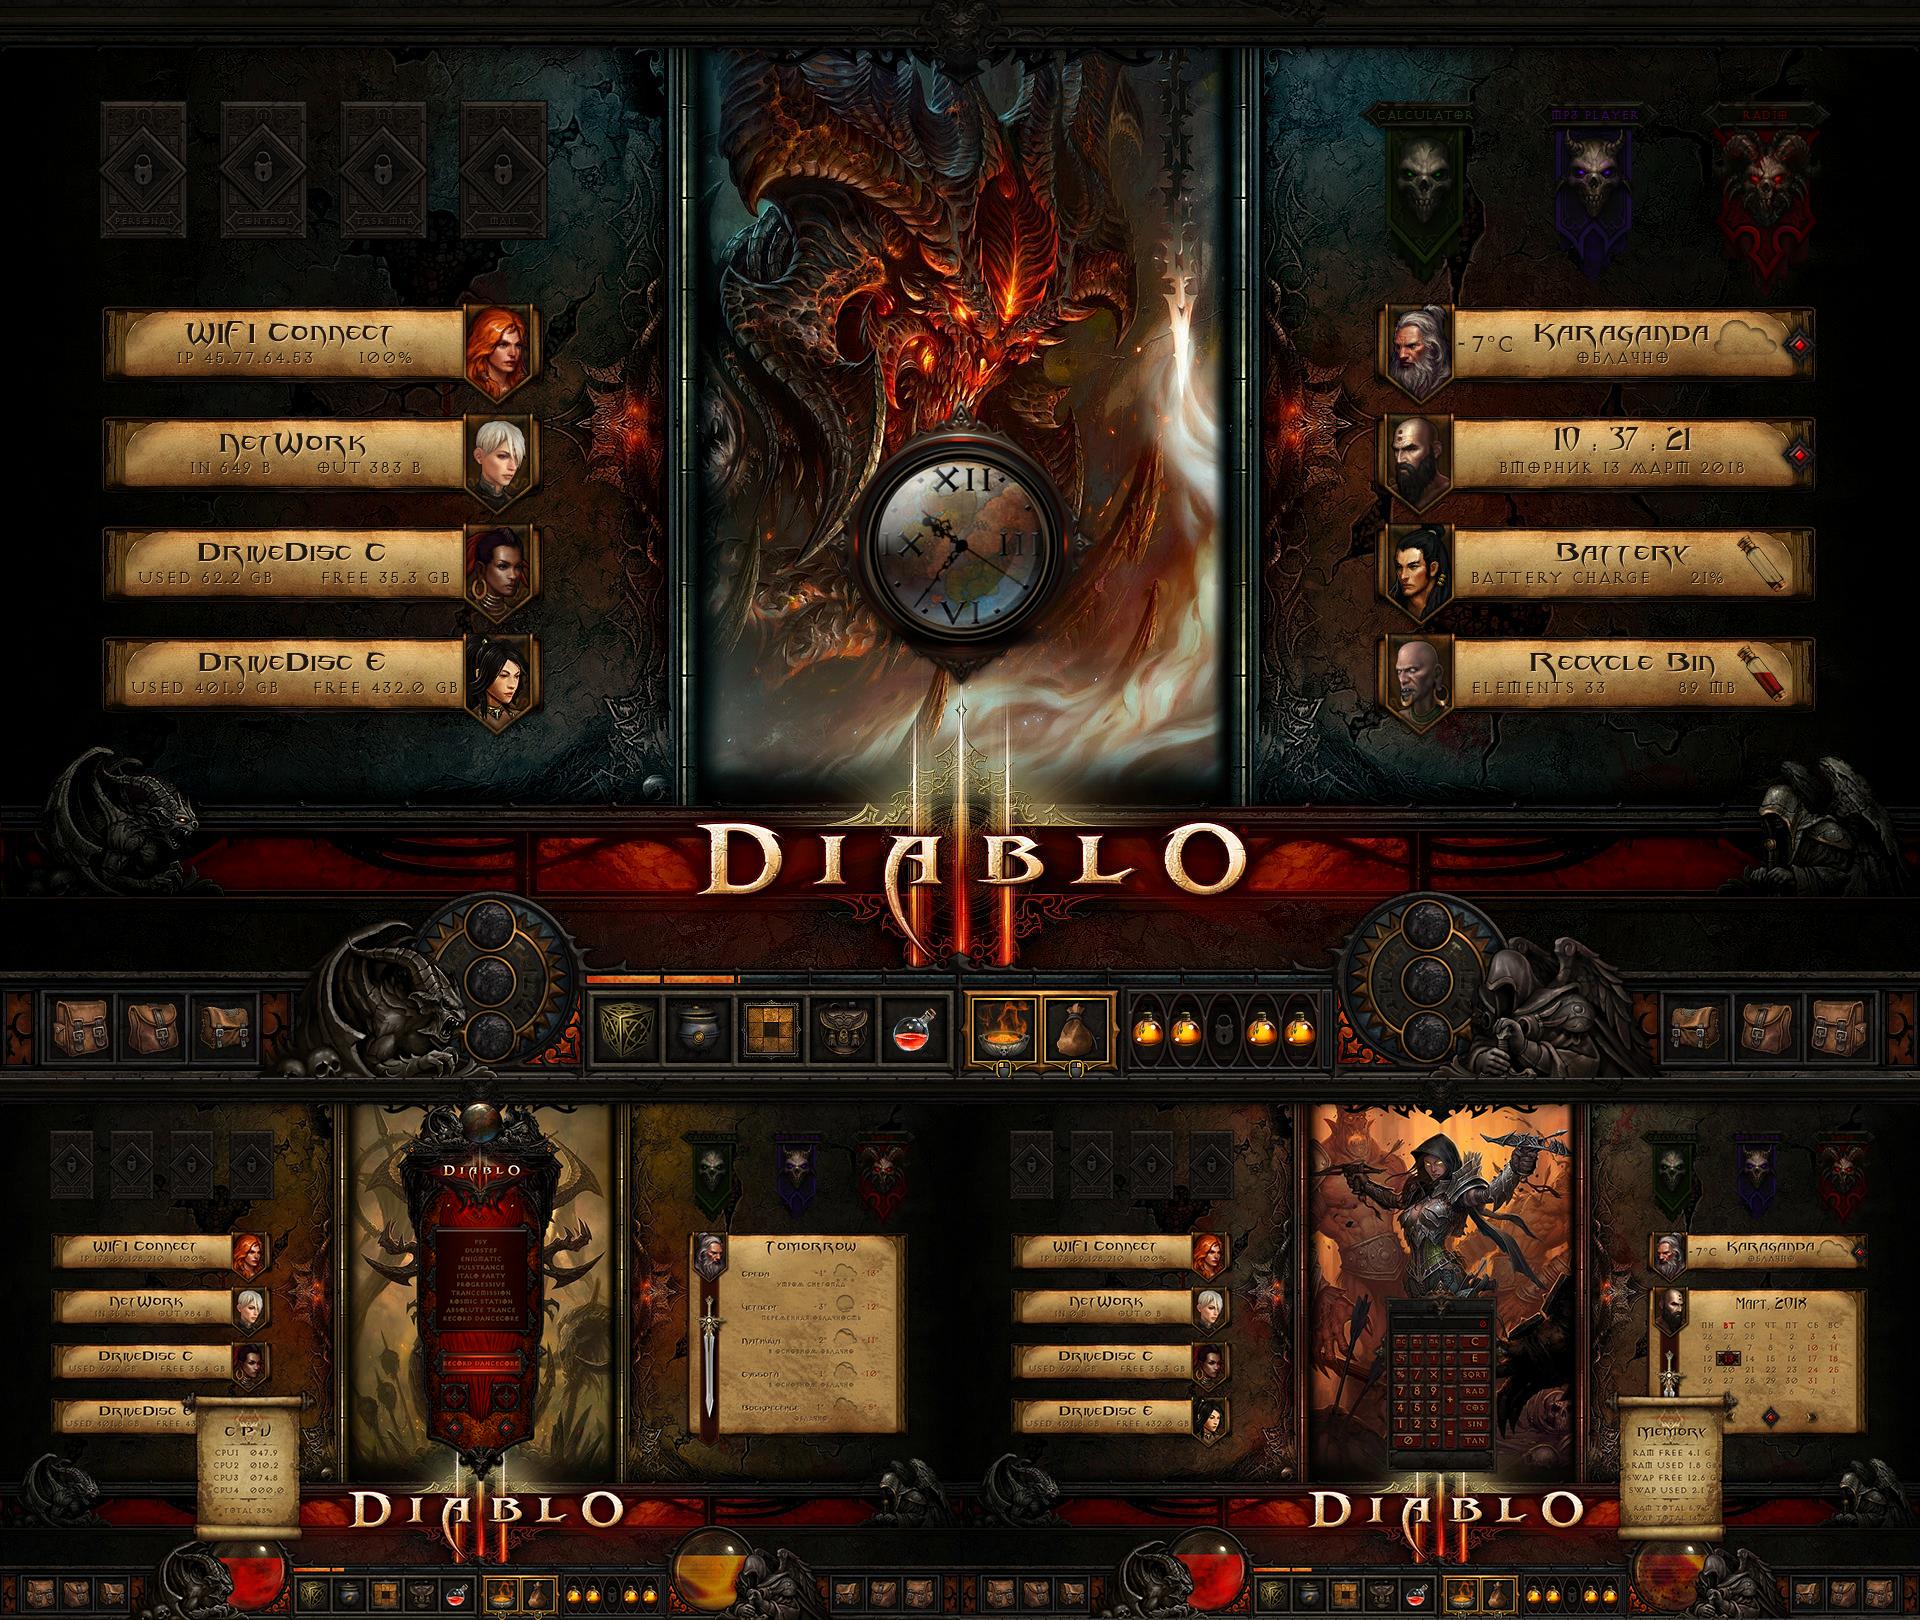 Diablo 3 Wallpaper 1920x1080: DIABLO III Theme For Rainmeter By ORTHODOXX67 On DeviantArt